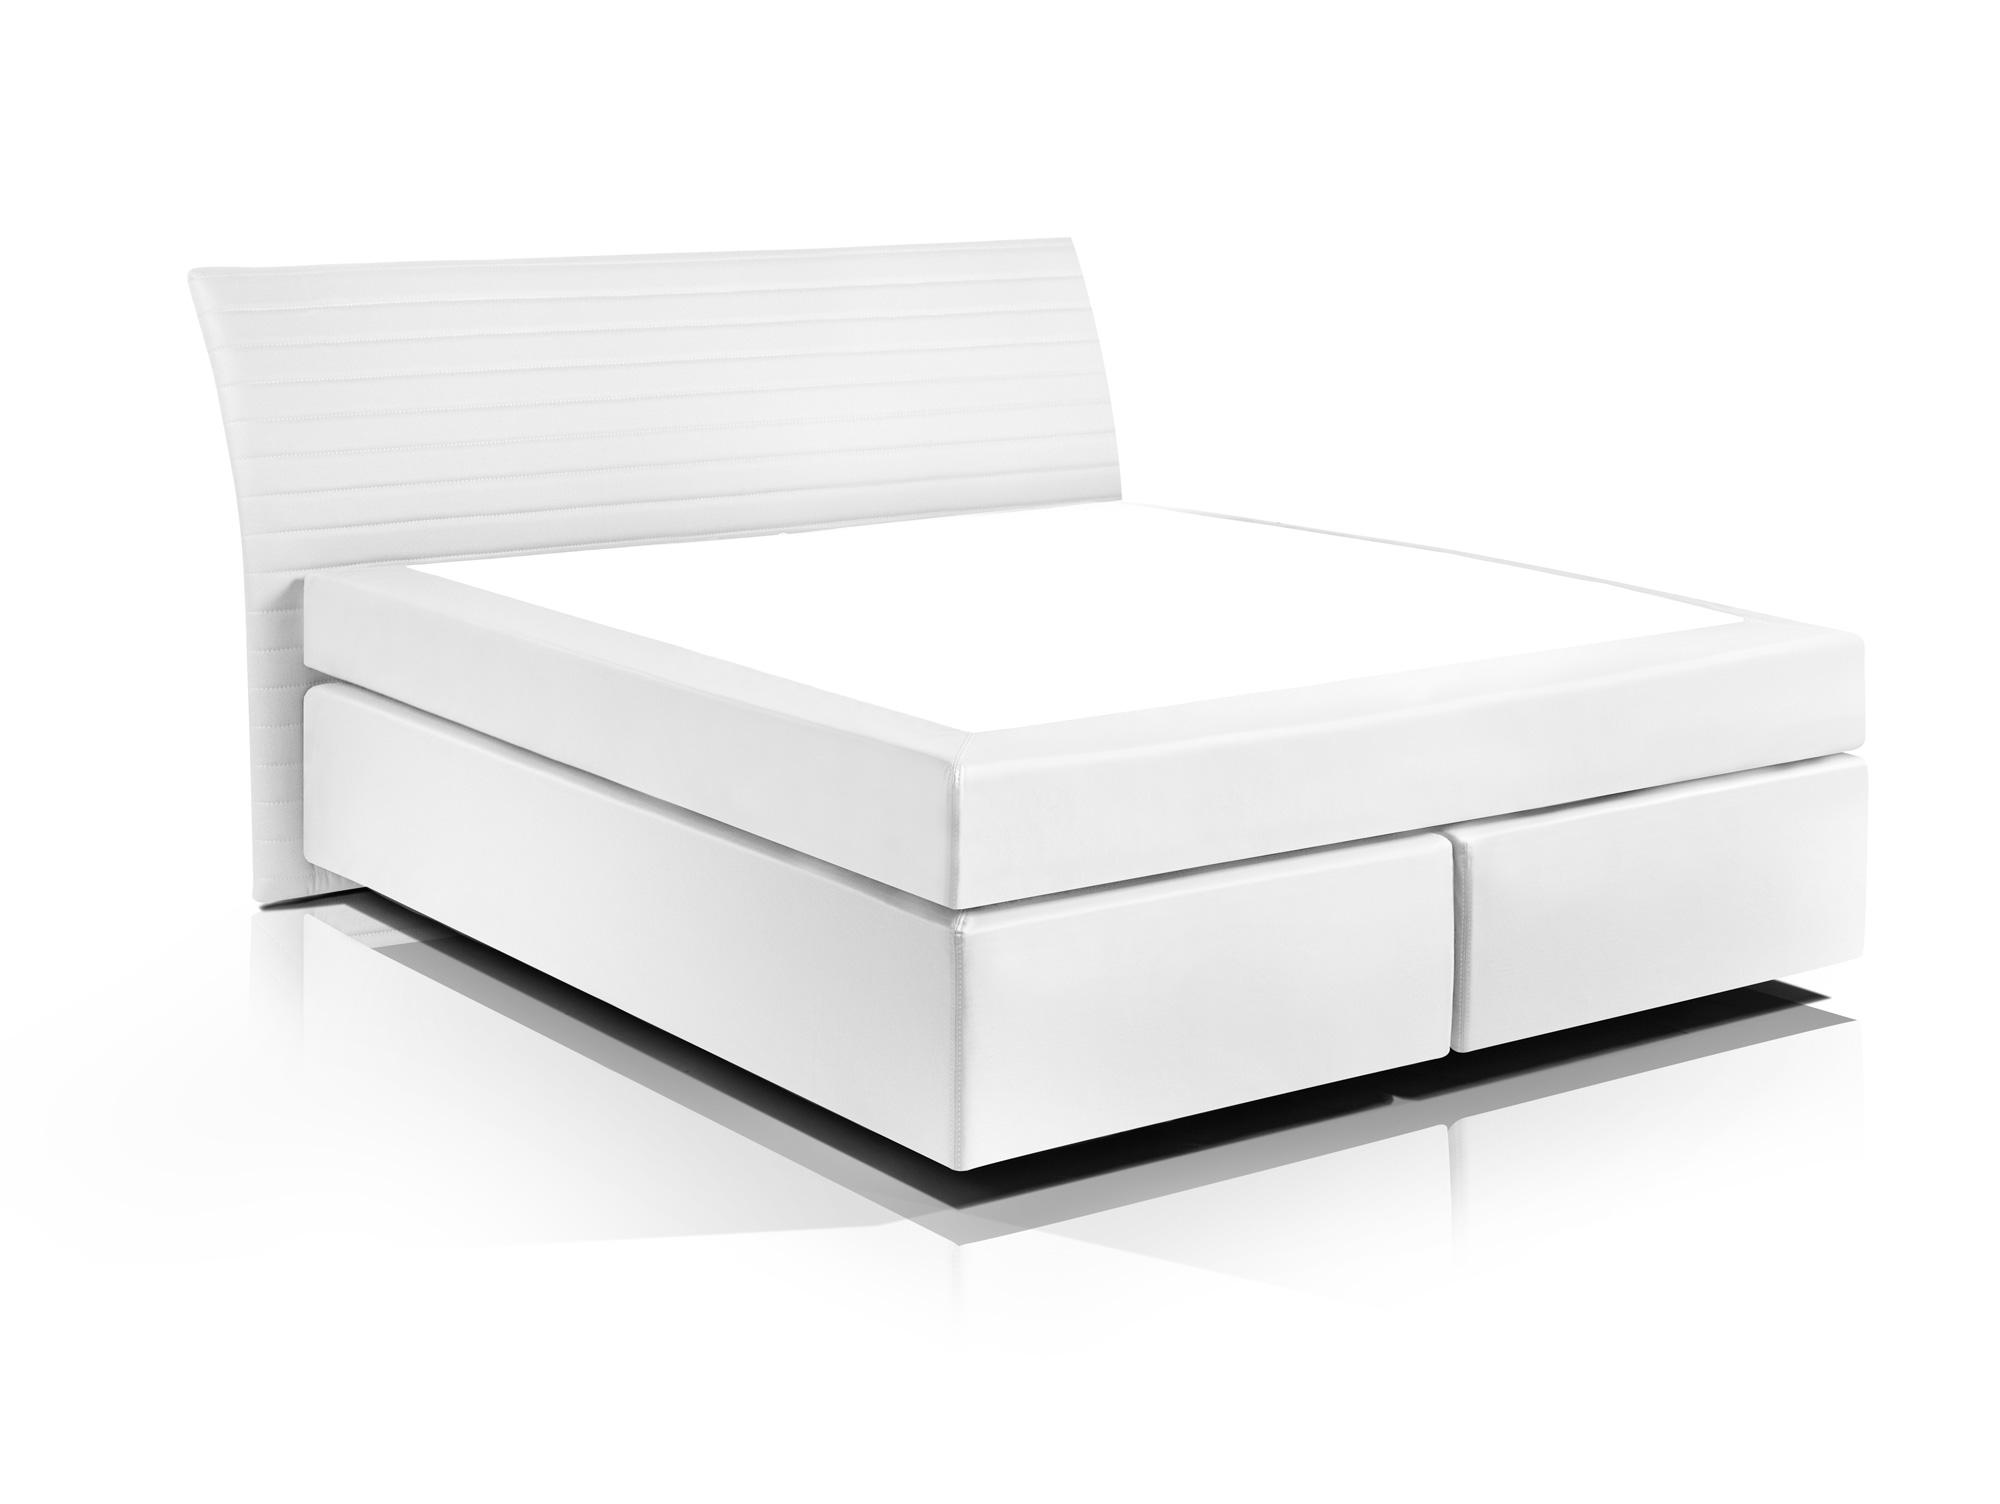 heaven boxspringbett kunstlederbezug 160 x 200 cm weiss h rtegrad 2 3. Black Bedroom Furniture Sets. Home Design Ideas